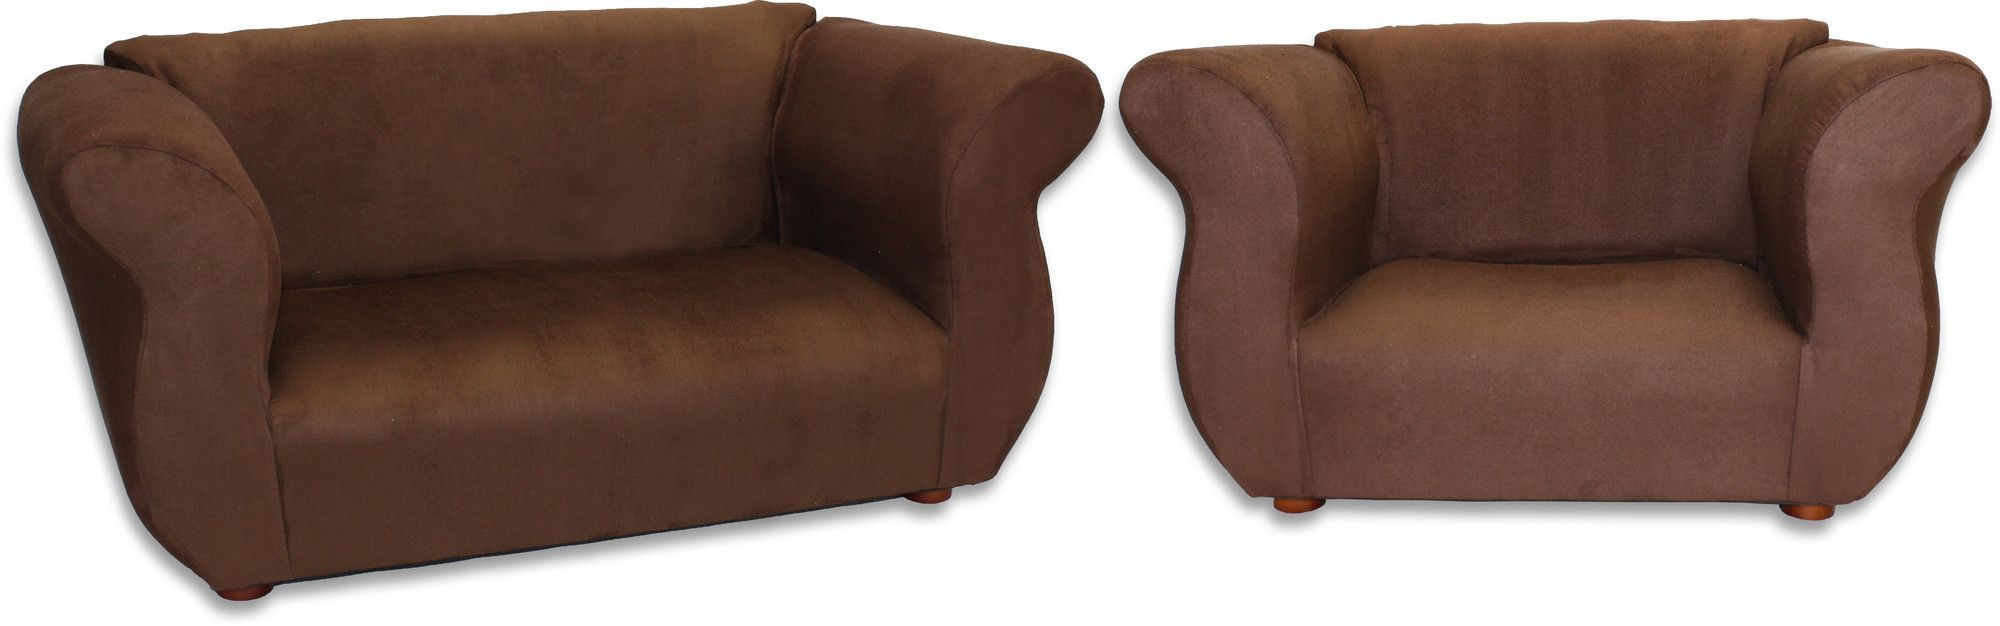 Kidu0027s Fancy Microsuede Sofa And Chair Set